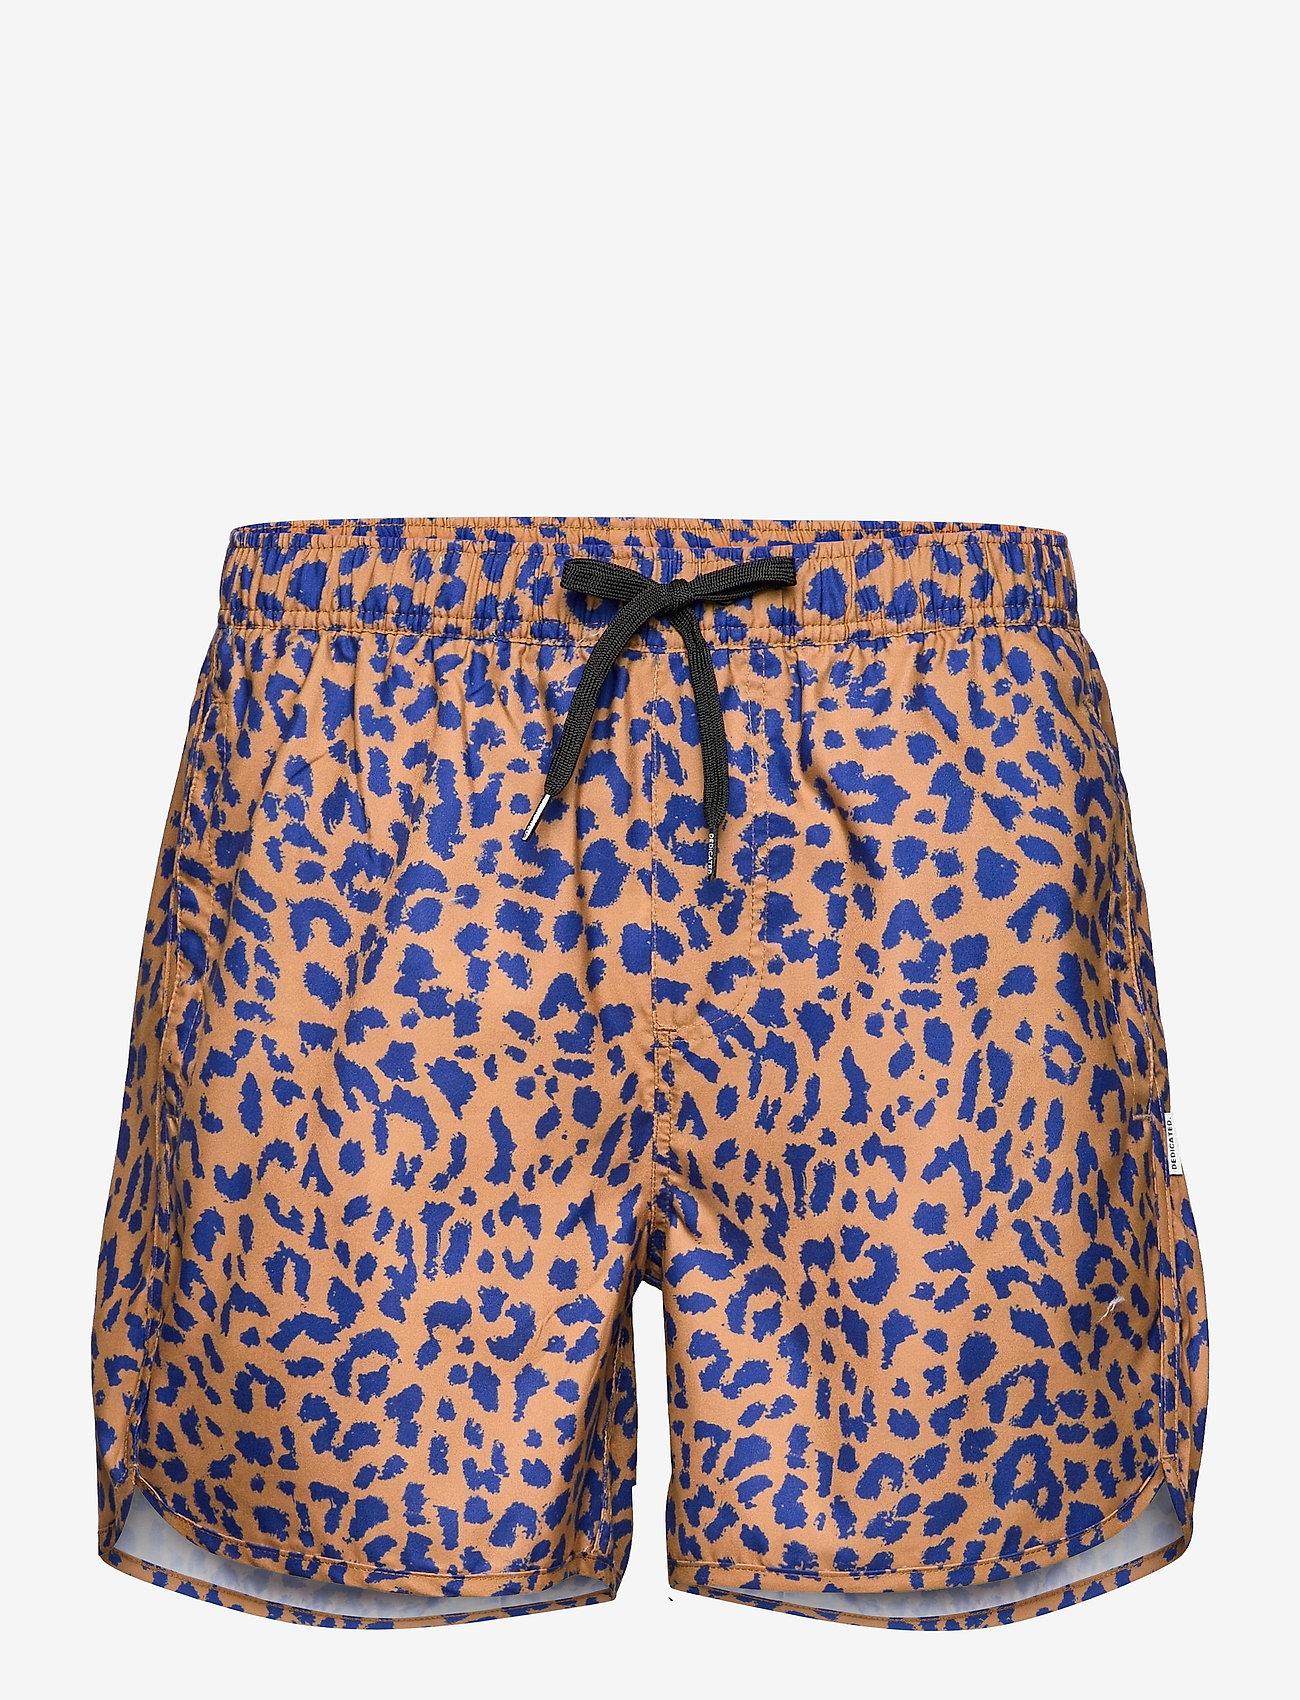 DEDICATED - Swim Shorts Sandhamn Leopard Light Brown - shorts de bain - chipmunk - 0